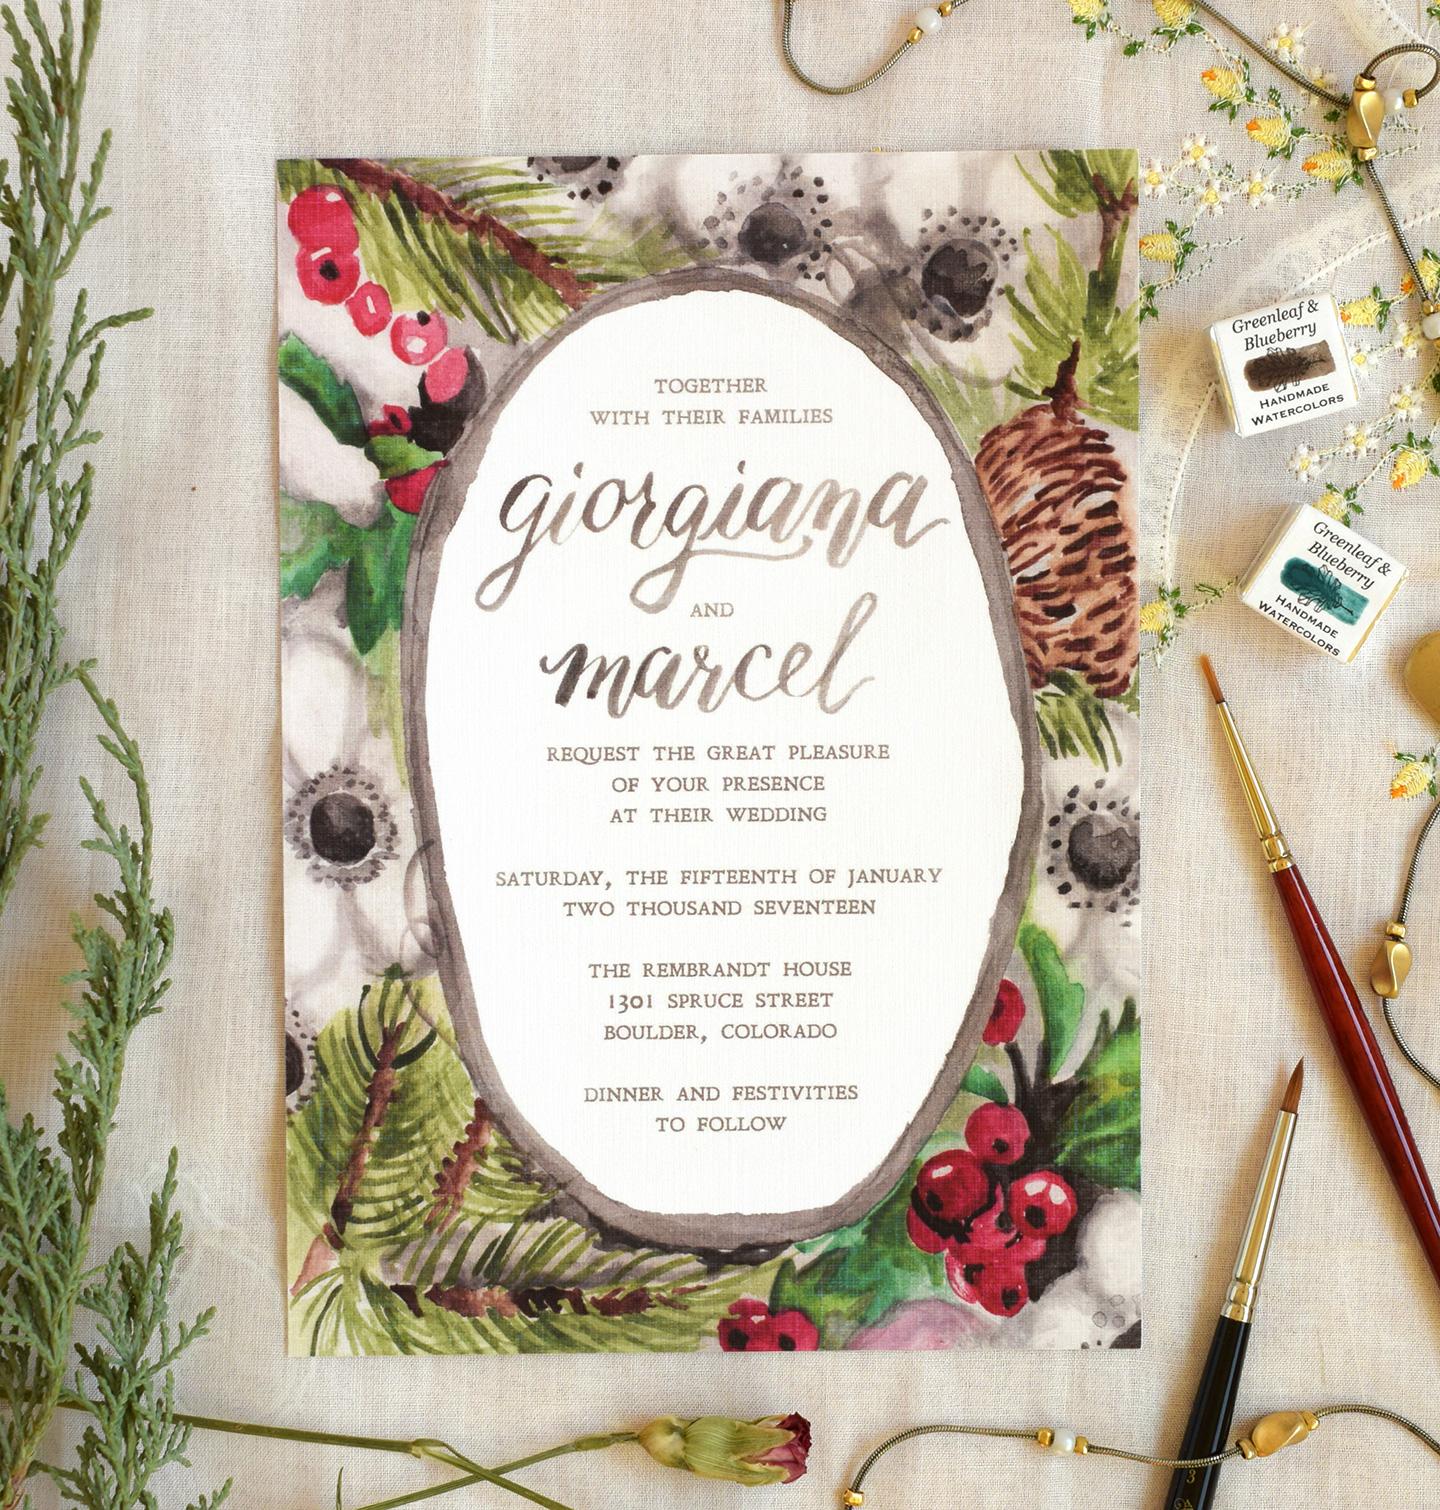 10 Artistic Wedding Invitation Ideas | The Postman's Knock